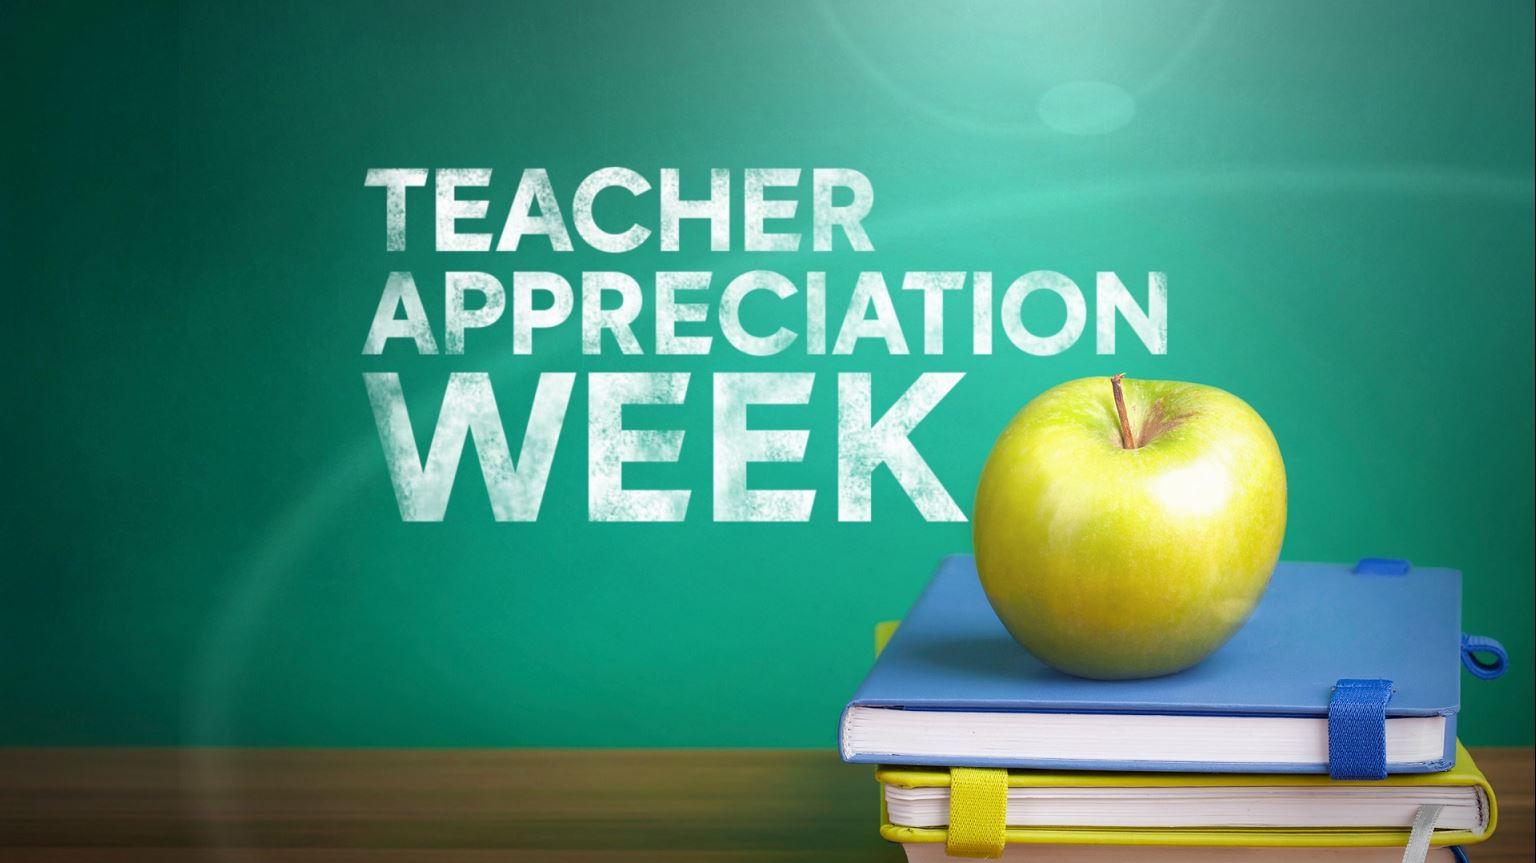 chickfila teacher appreciation 2020